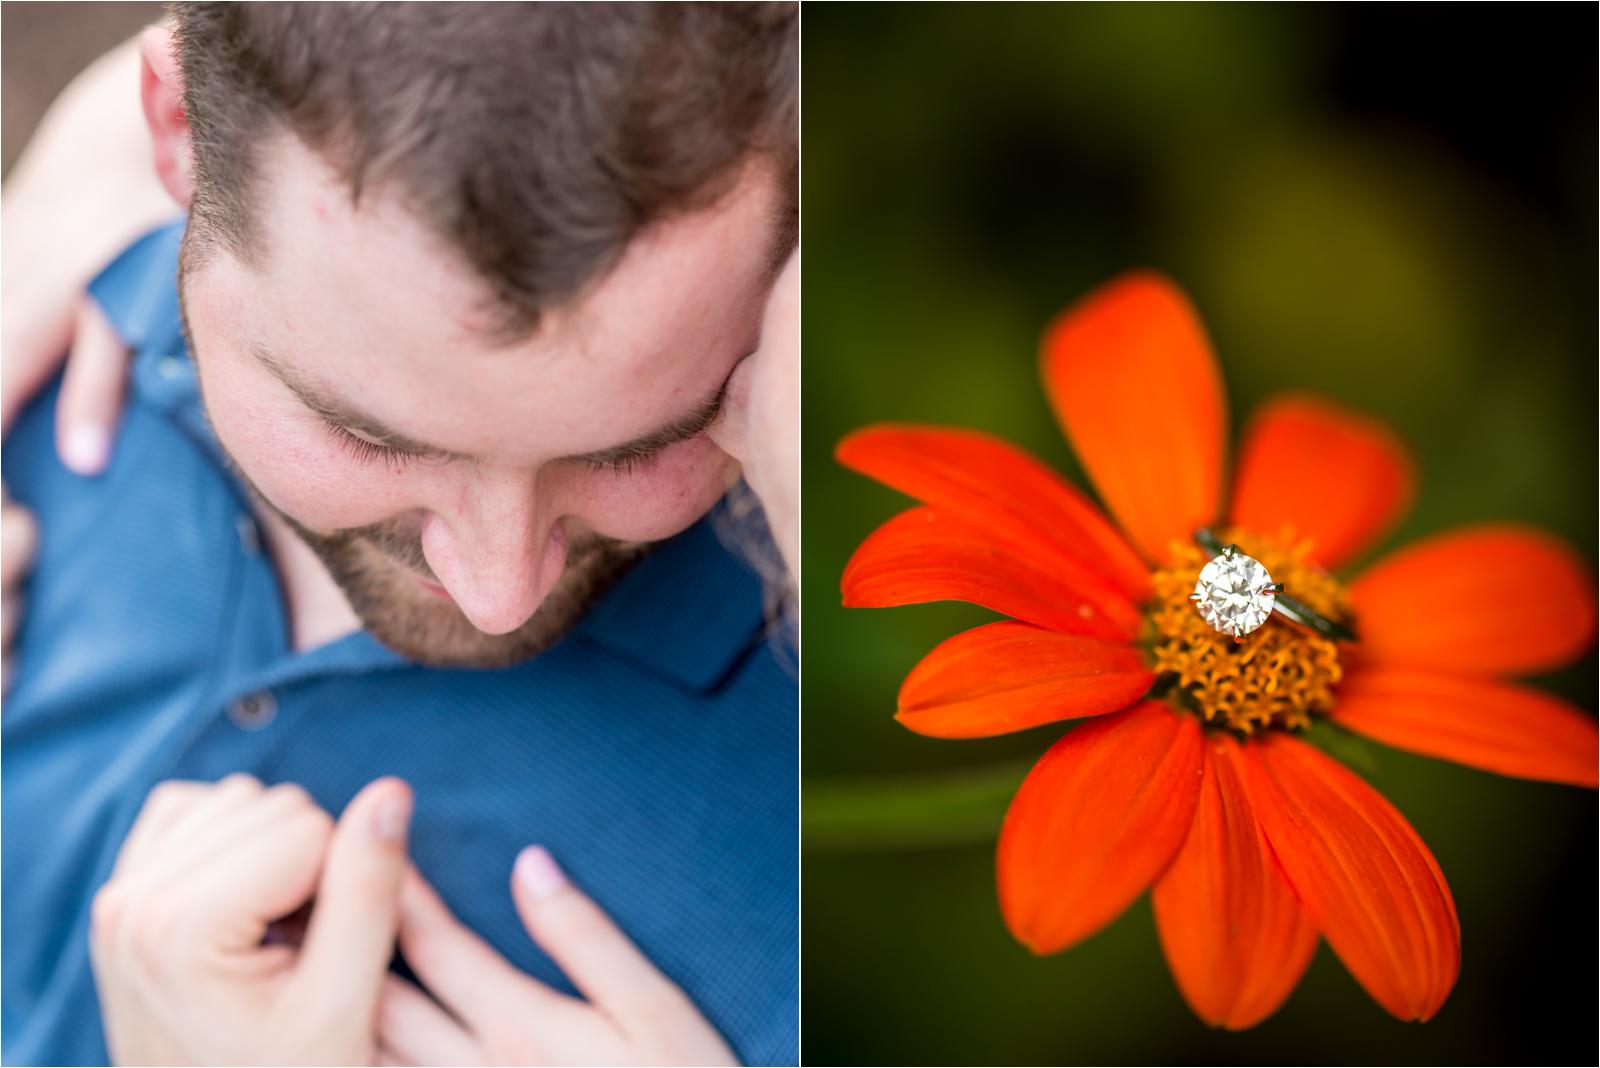 engagement-session-thanksgiving-proposal-story-man-woman-white-collared-shirt-blue-floral-dress-flower-garden-gardens-tuckahoe-plantation-richmond-virginia-jessica-capozzola-focus-on-joy-photography-richmond-virginia-rva